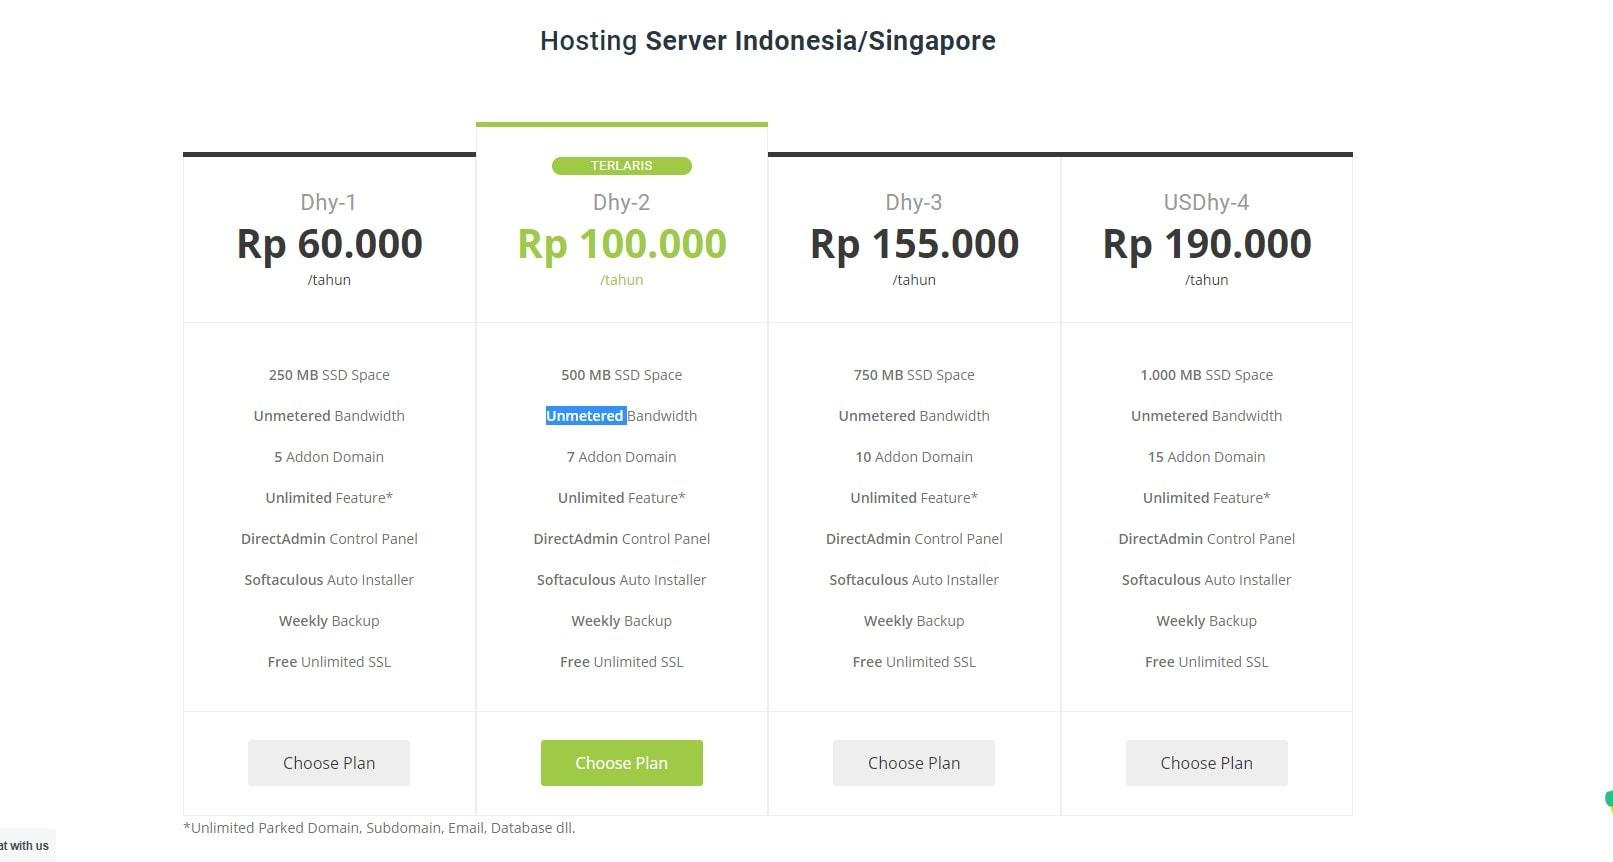 Daftar harga hosting DhyHost